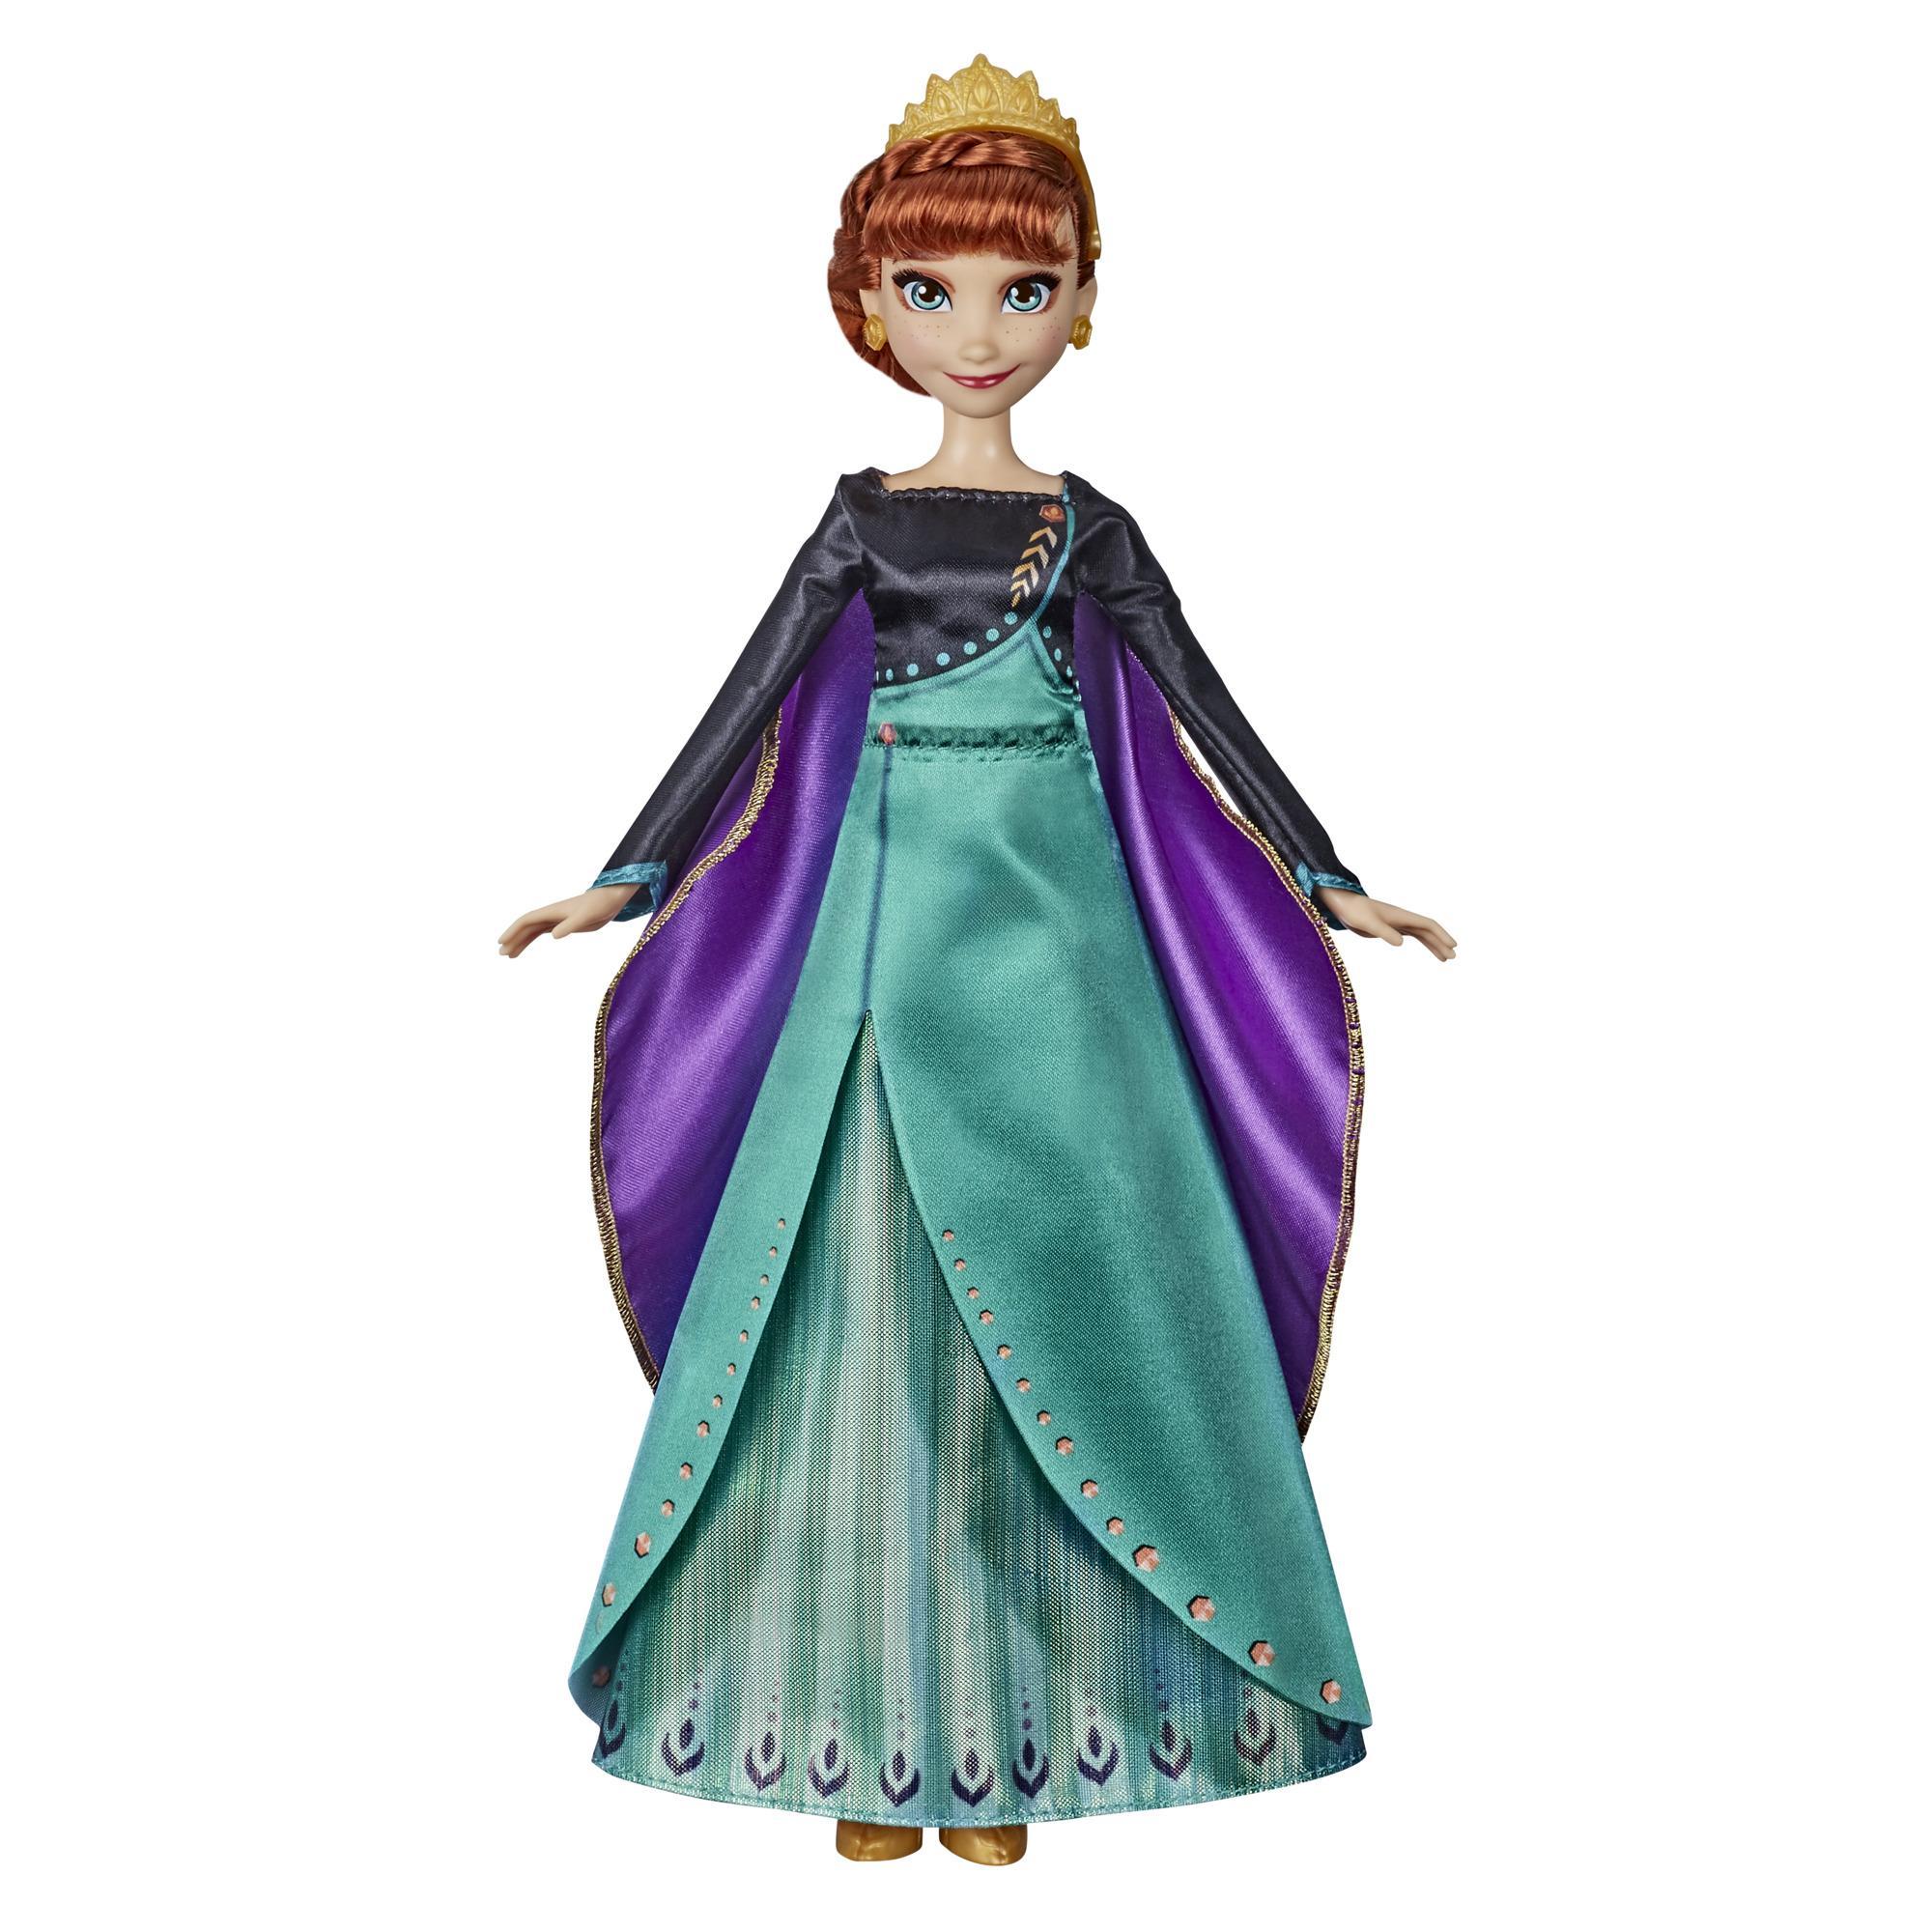 "Disney Frozen Musical Adventure Anna sjungande docka, sjunger sången ""Some Things Never Change"" från Disney-filmen Frost 2"